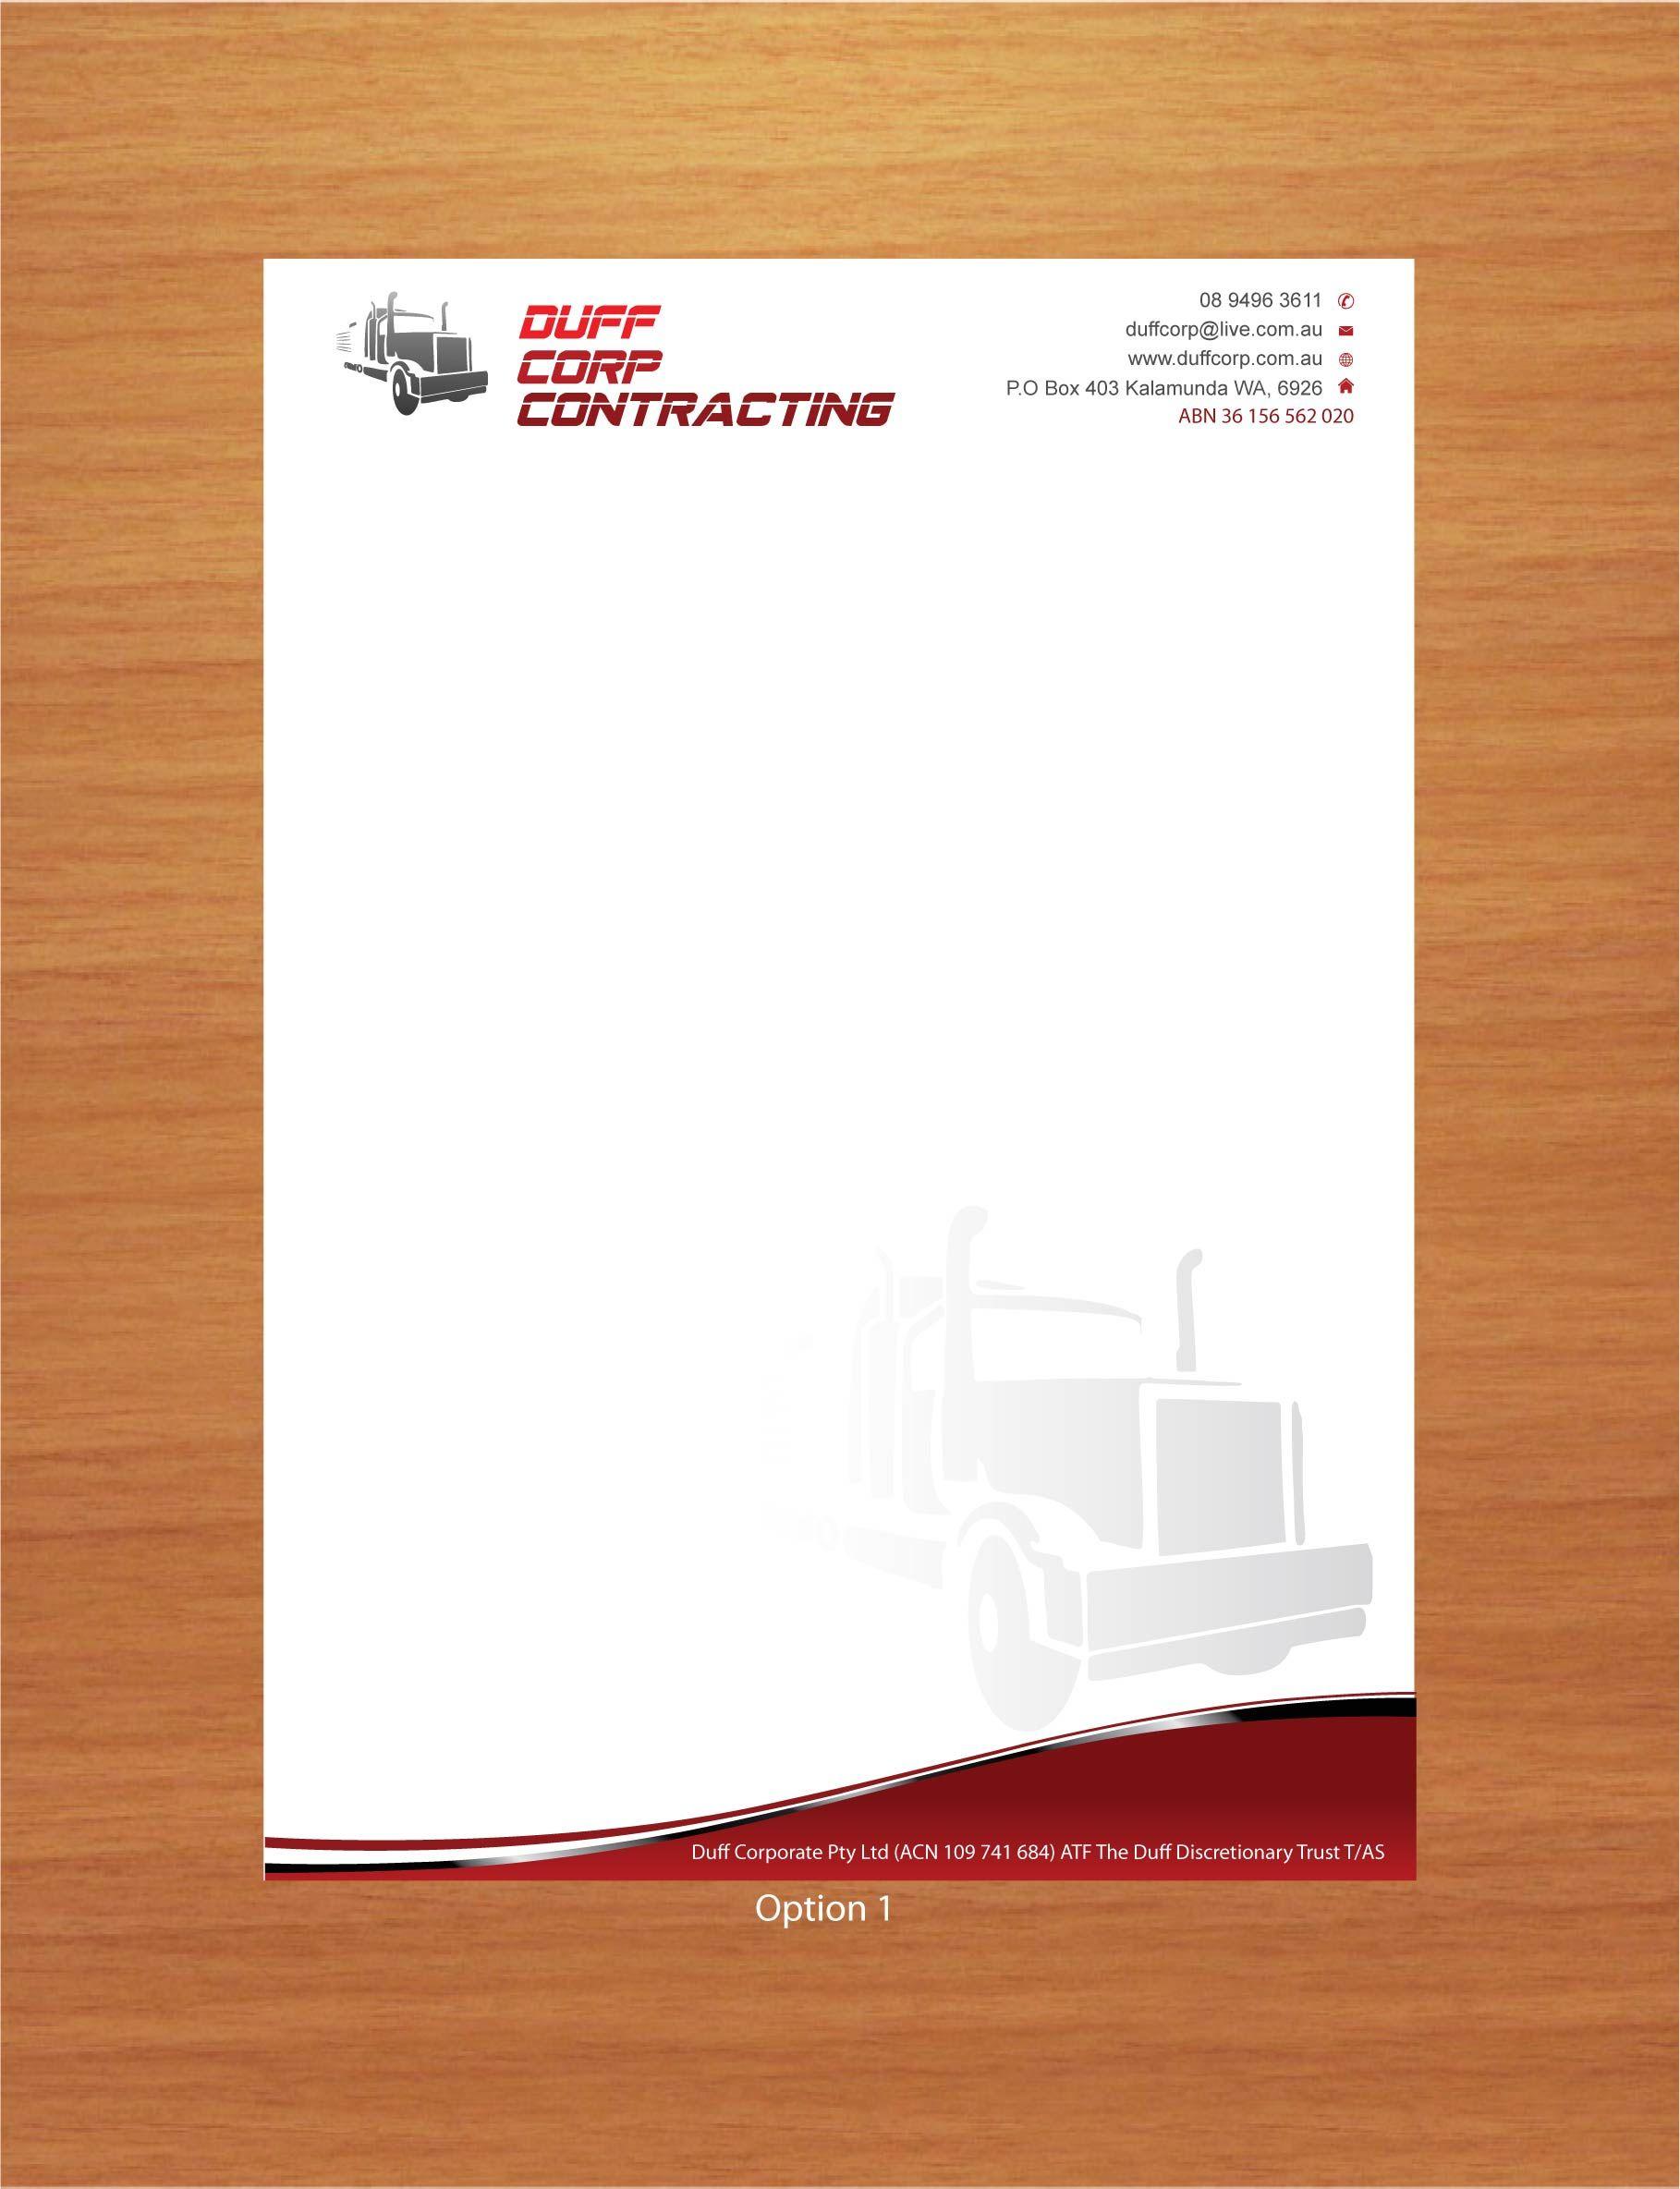 Duff Crop Contracting Letterhead Design Letterhead